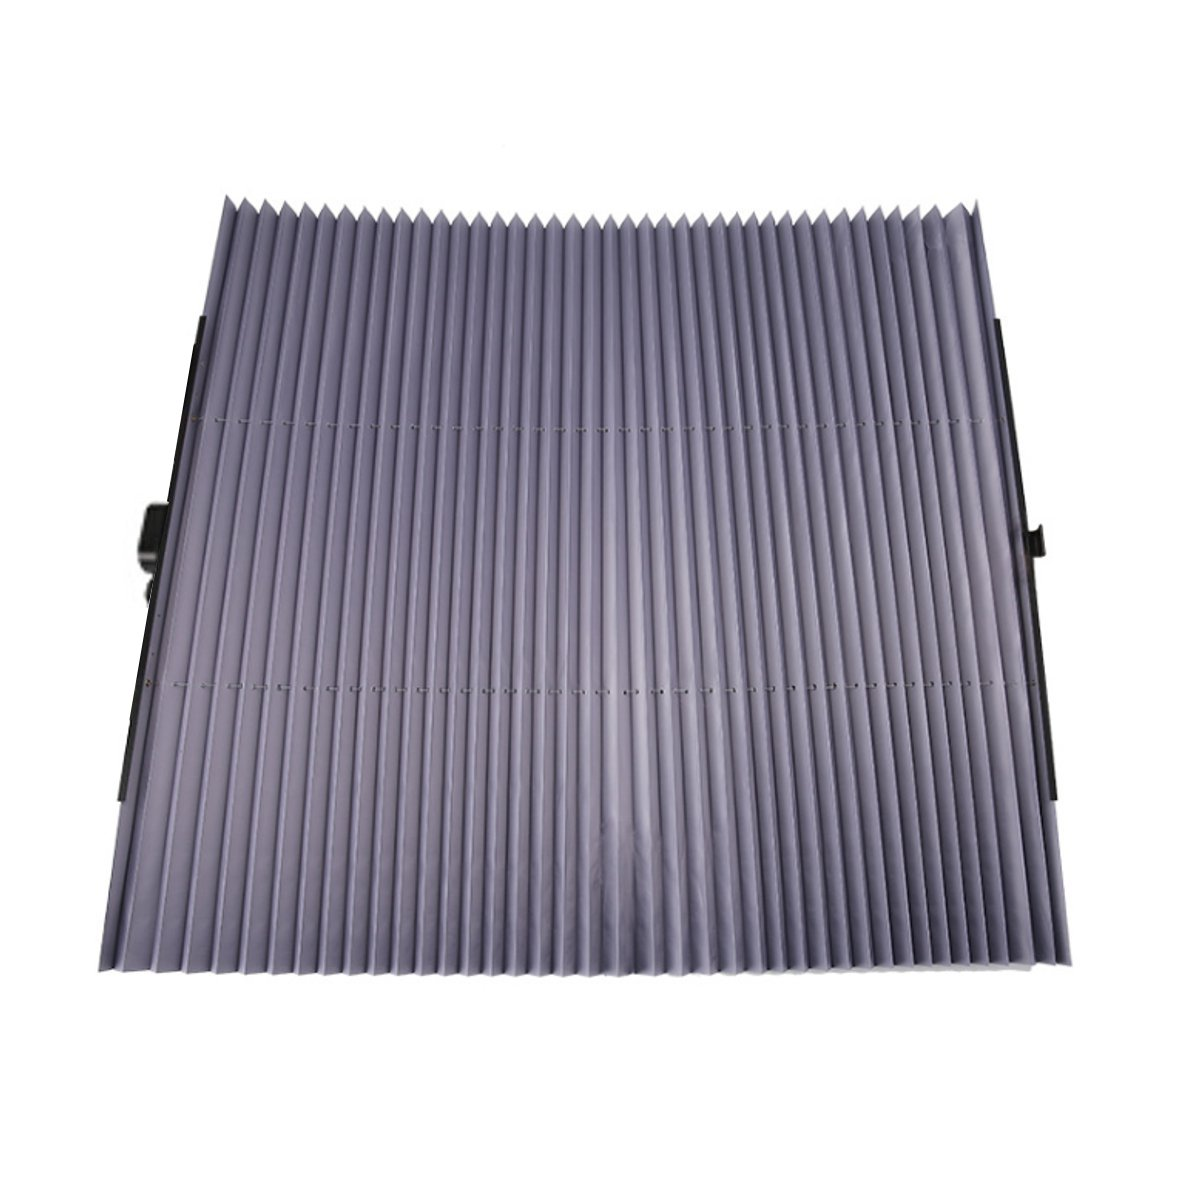 Car Auto Retractable Front Window Windshield Folding Sun Shade Visor Block Cover